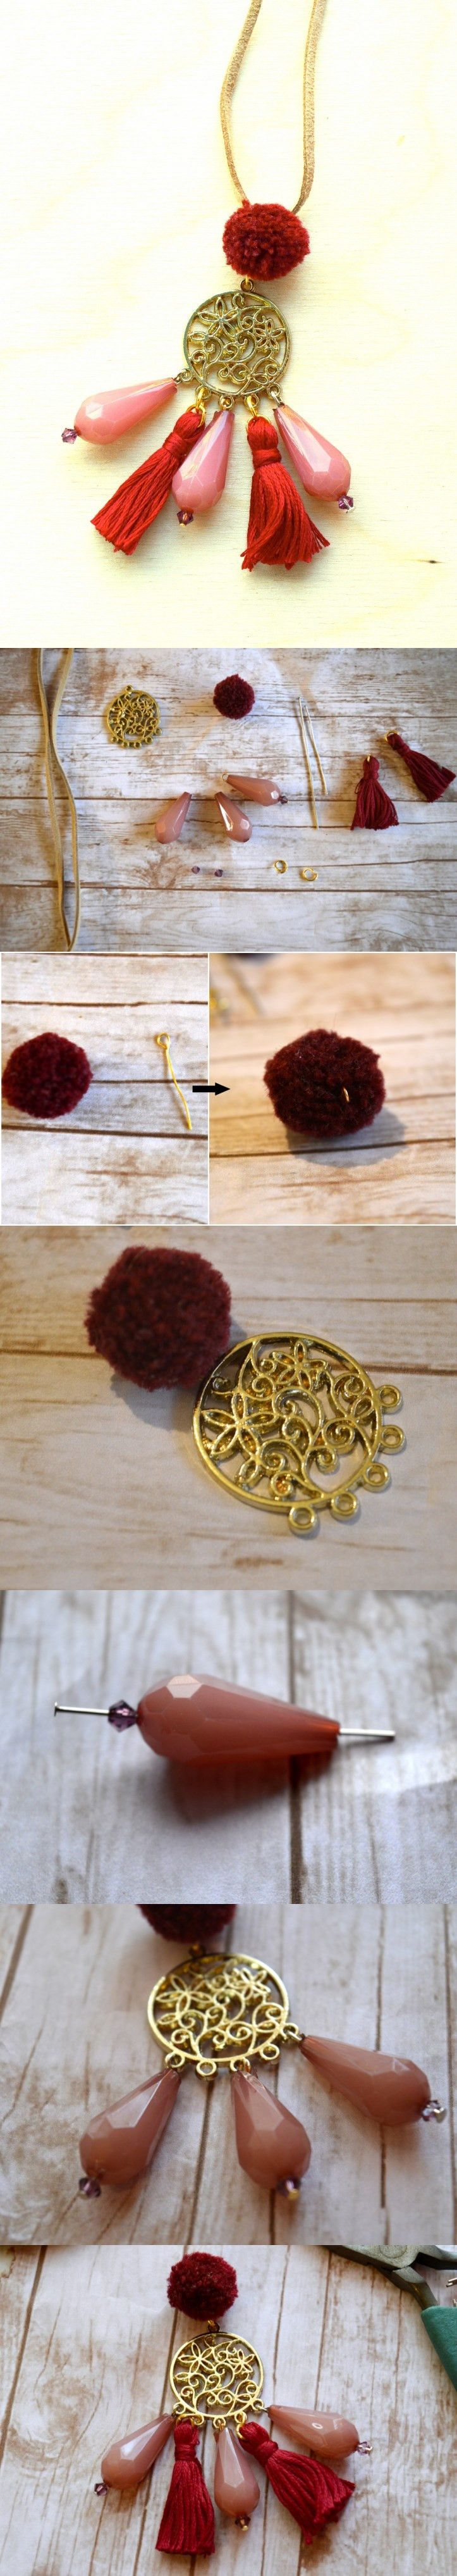 How to Make a Boho Chic Pom Pom and Tassels Necklace